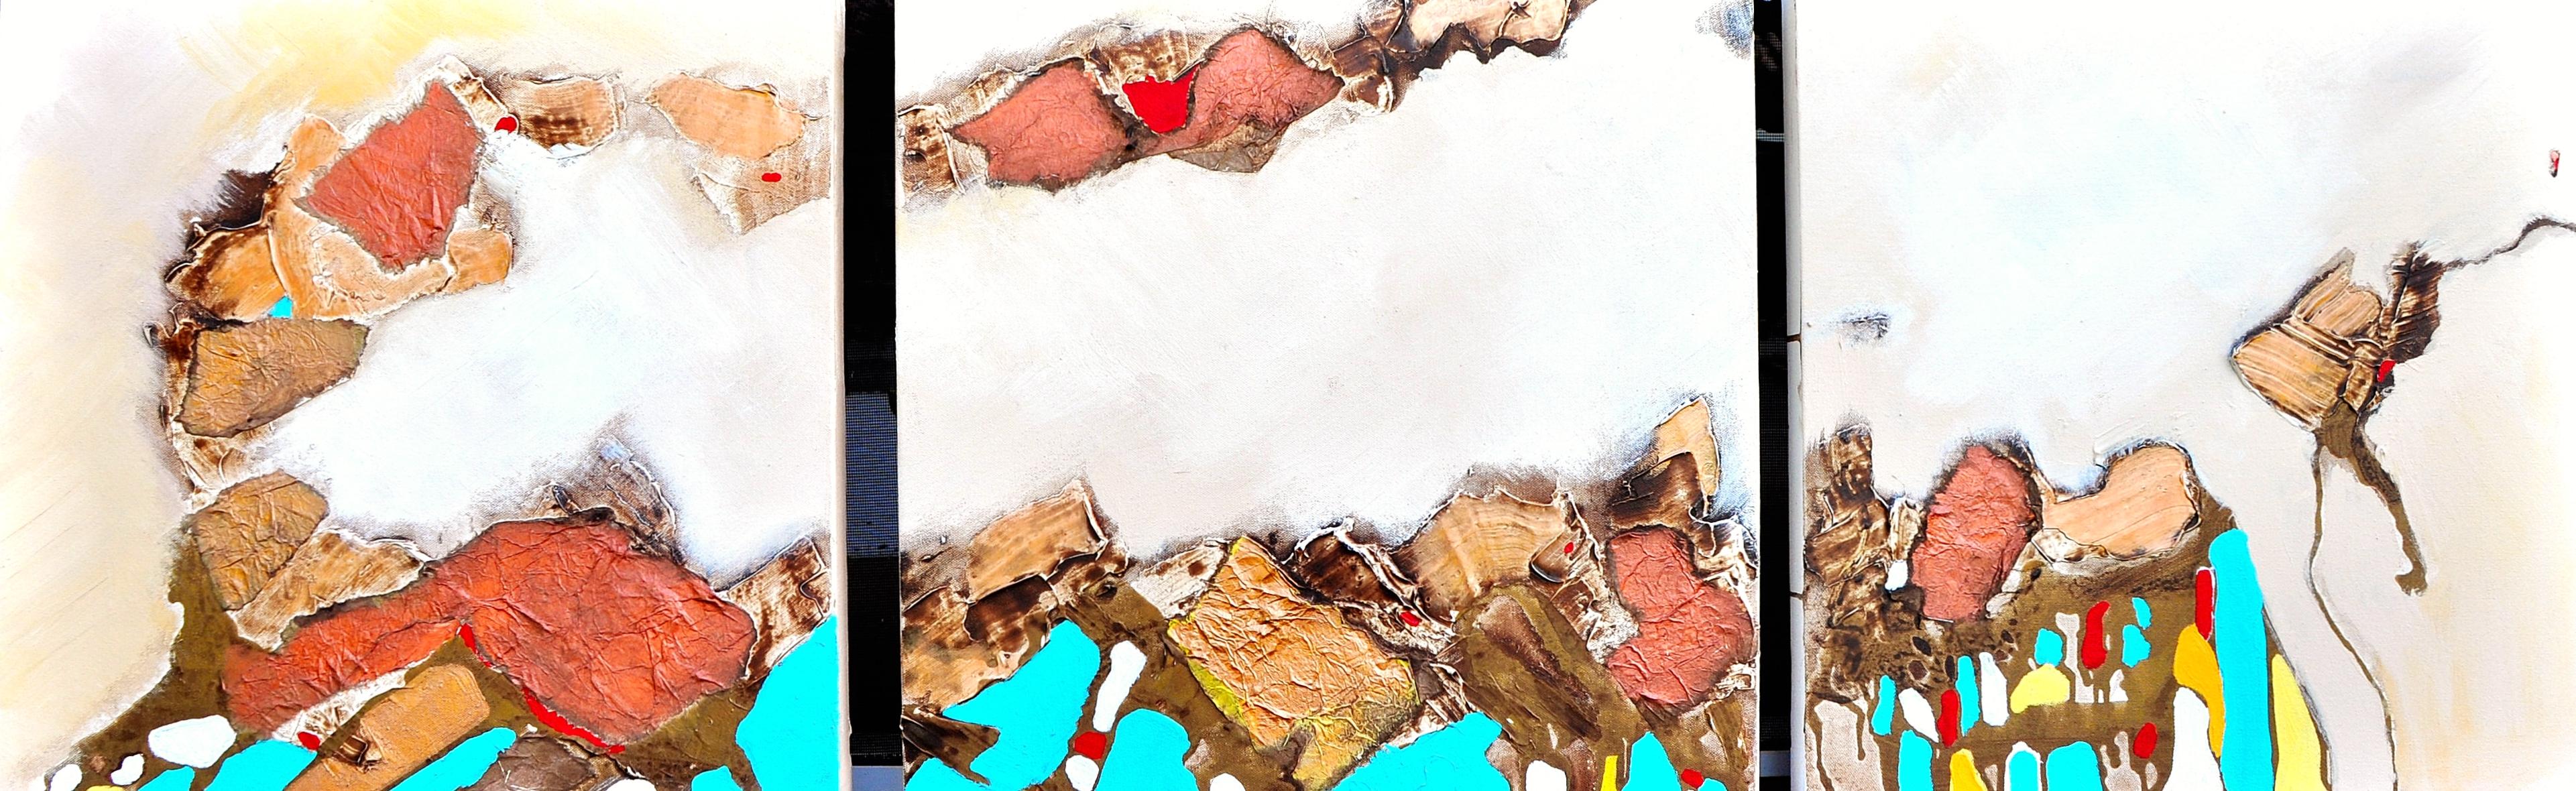 Sandstone 5 triptych,20x60,2014,Sold